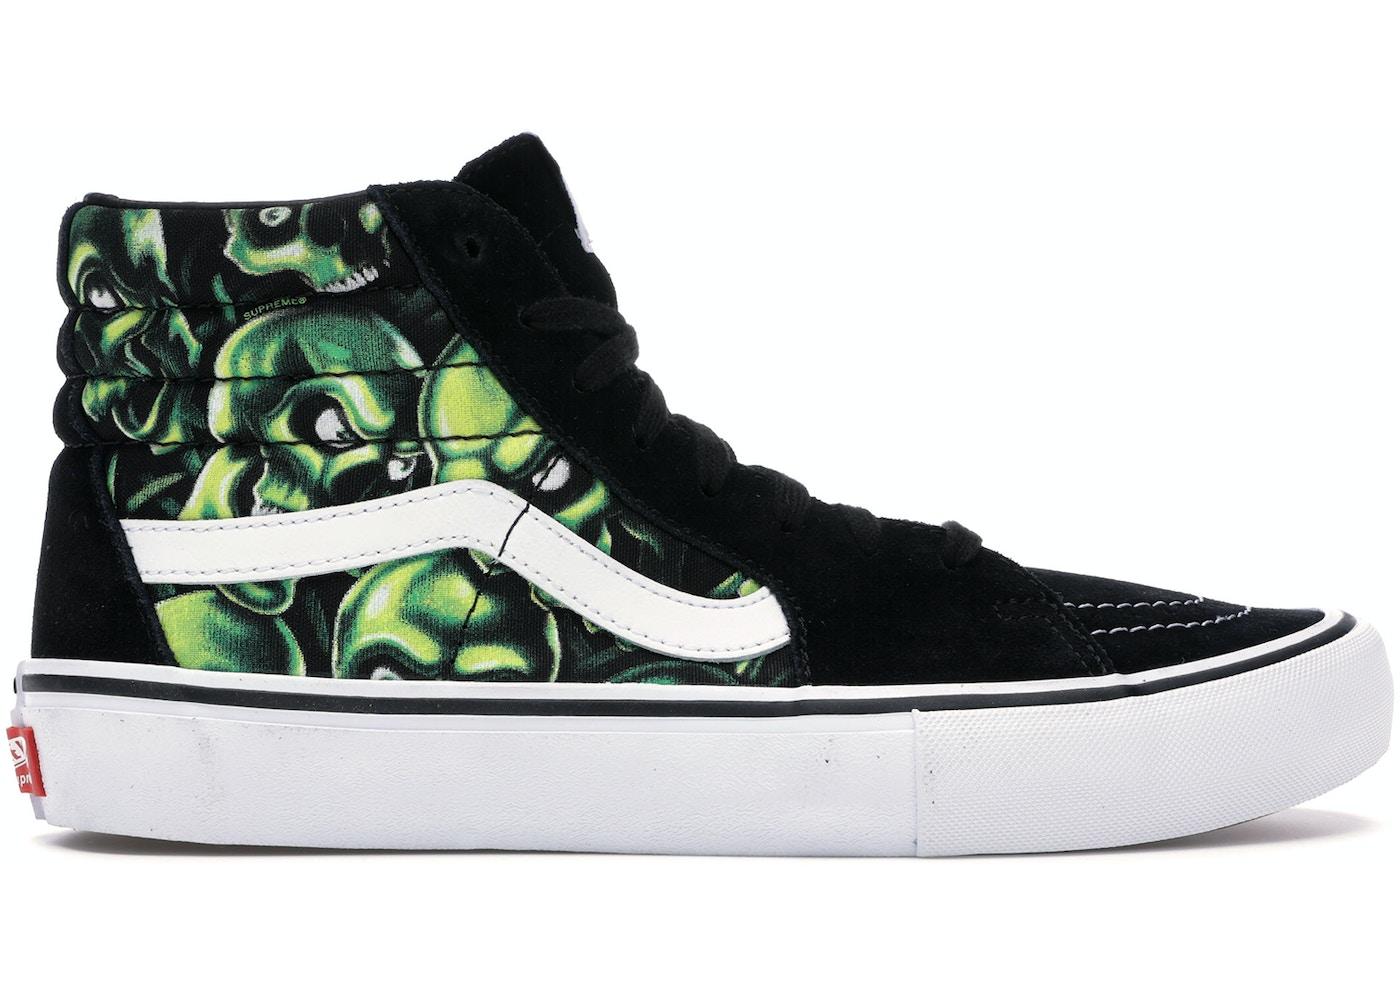 0eee4d70ac Vans Sk8-Hi Supreme Skull Pile (Green) - VN000VHG3FW